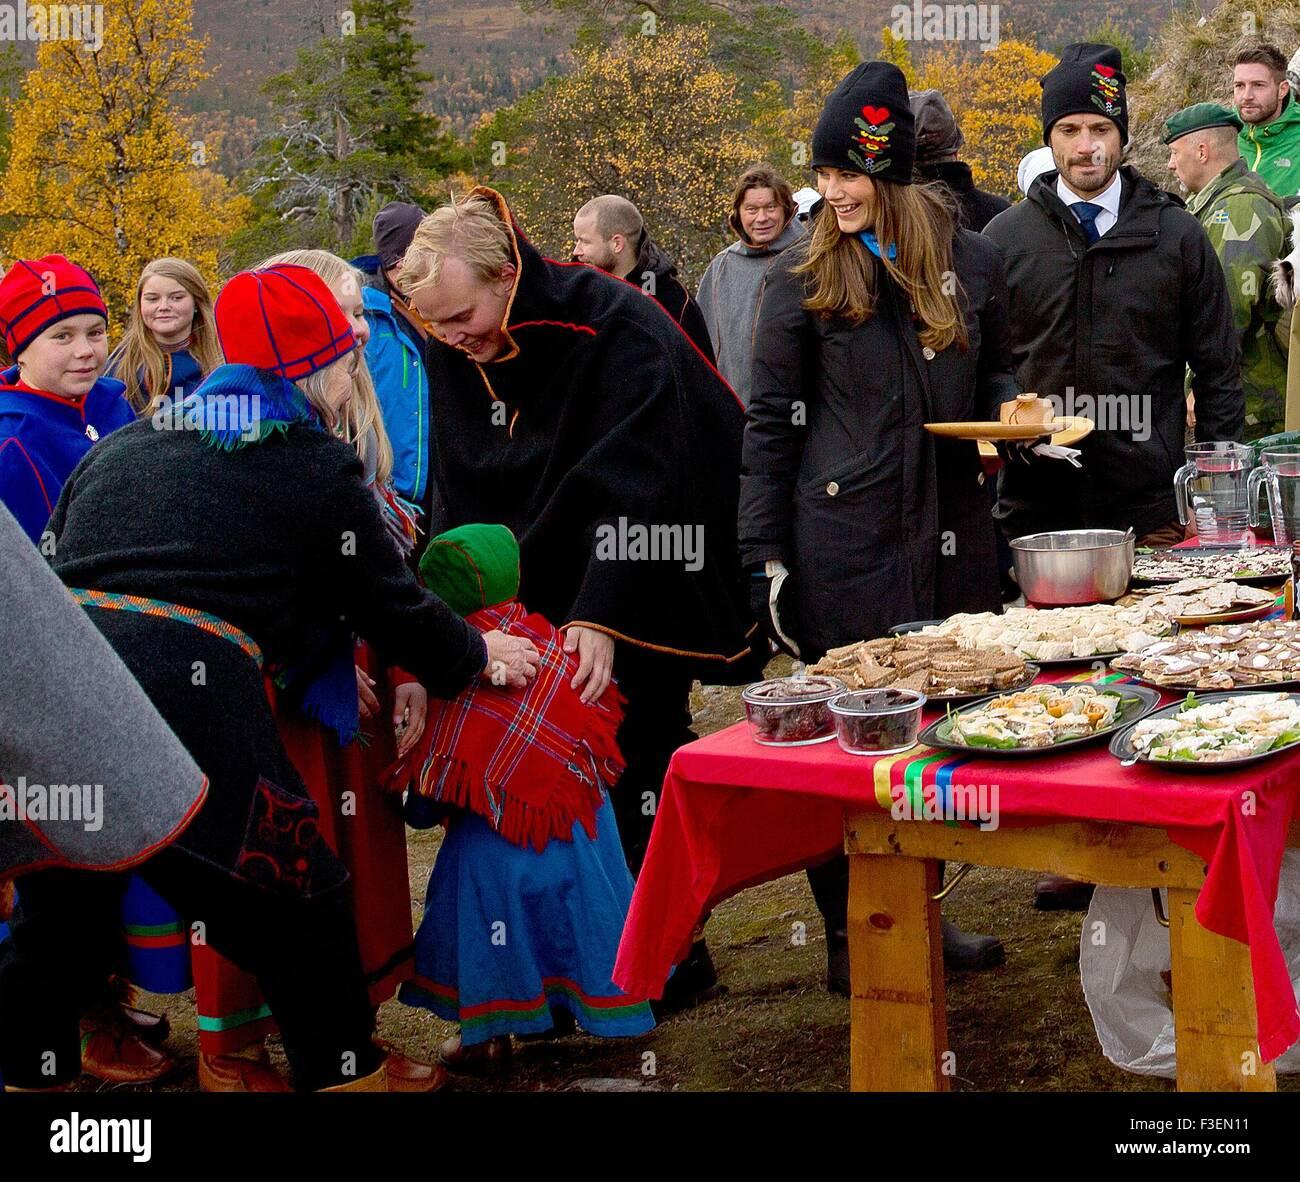 Dalarna, Sweden. 6th October, 2015. HRH Prince Carl Philip and HRH Princess Sofia Visit to Idre Sami village Last - Stock Image